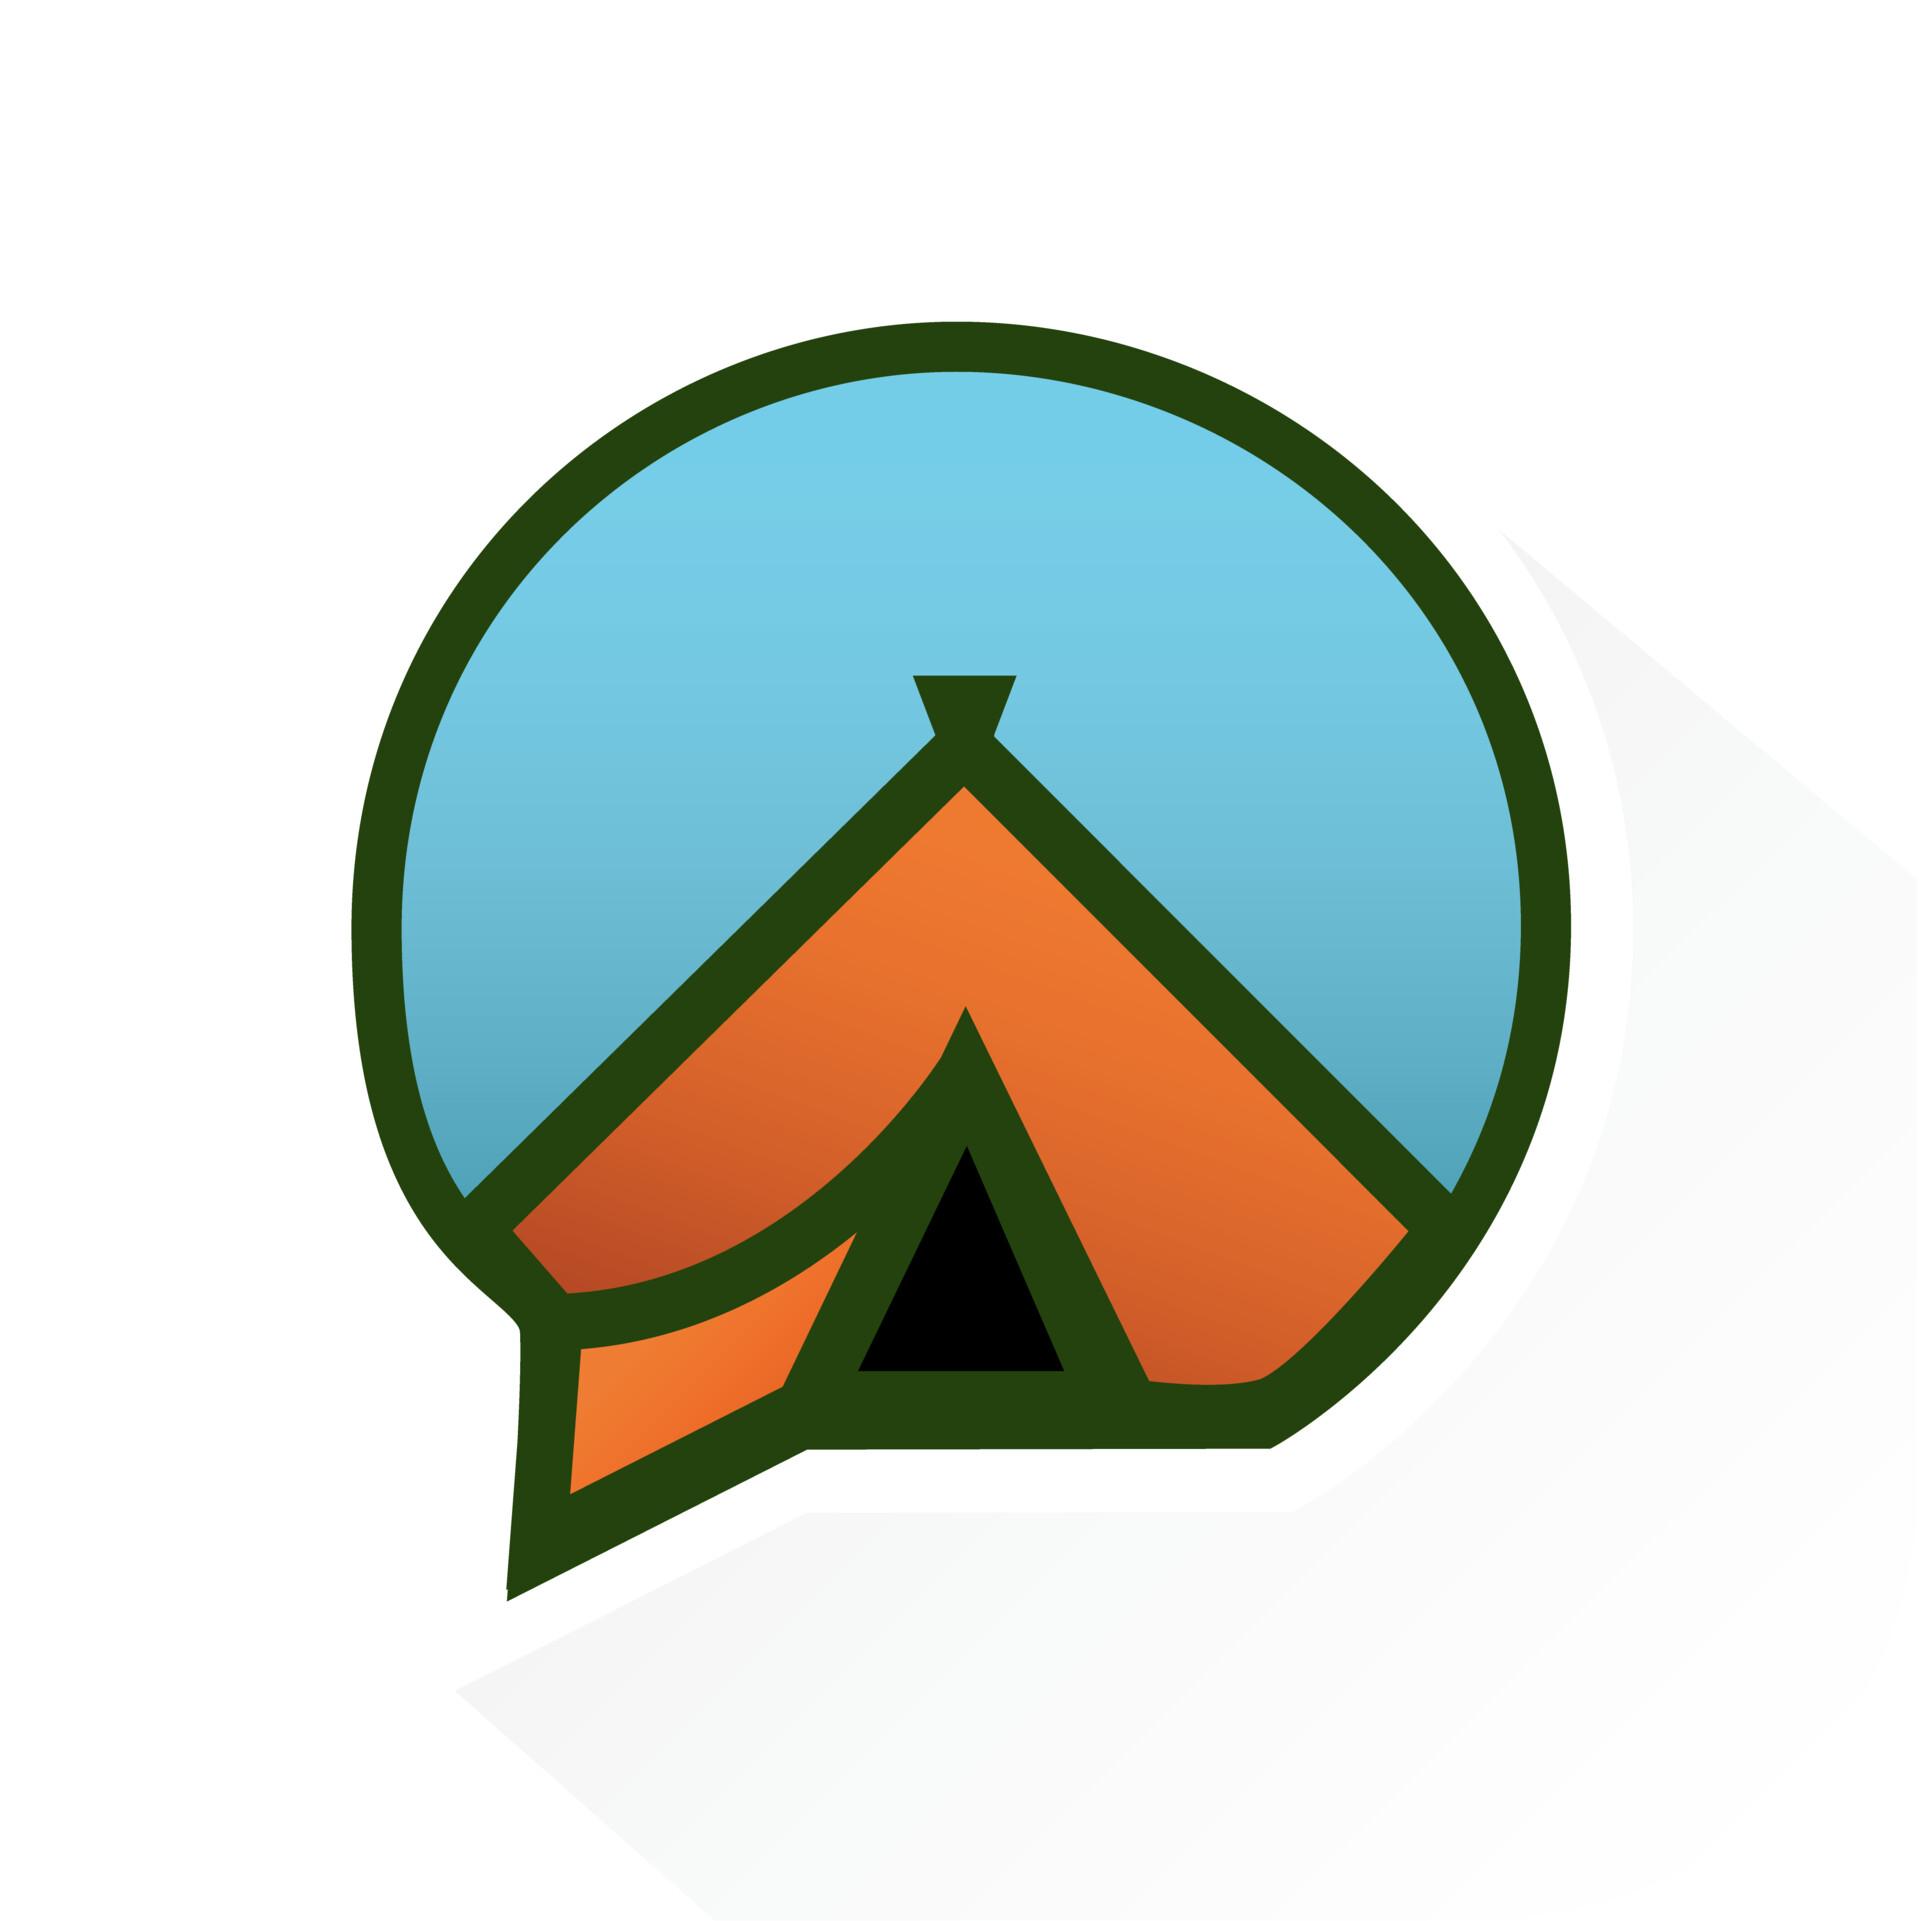 Alecs ganoria parkchat app